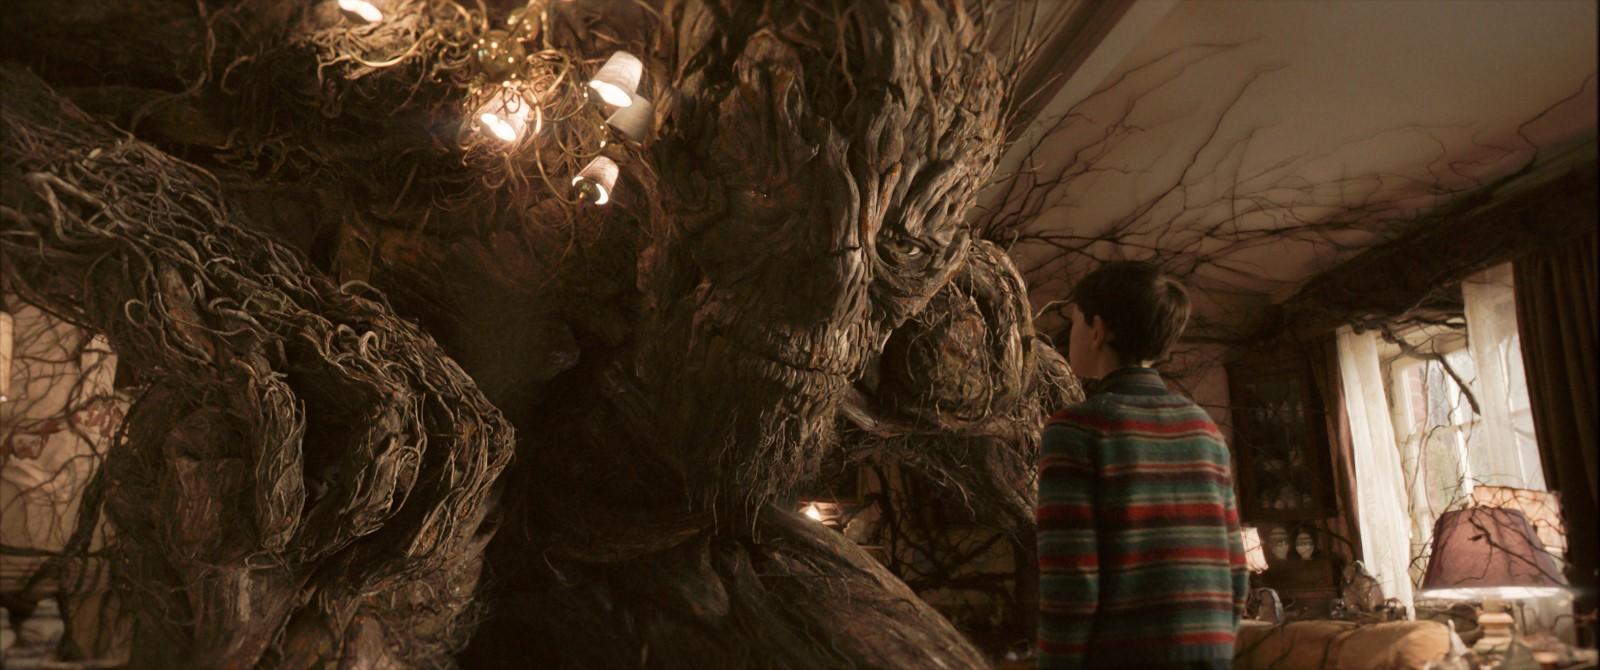 Conor (Lewis MacDougall) und das Monster (Liam Neeson)